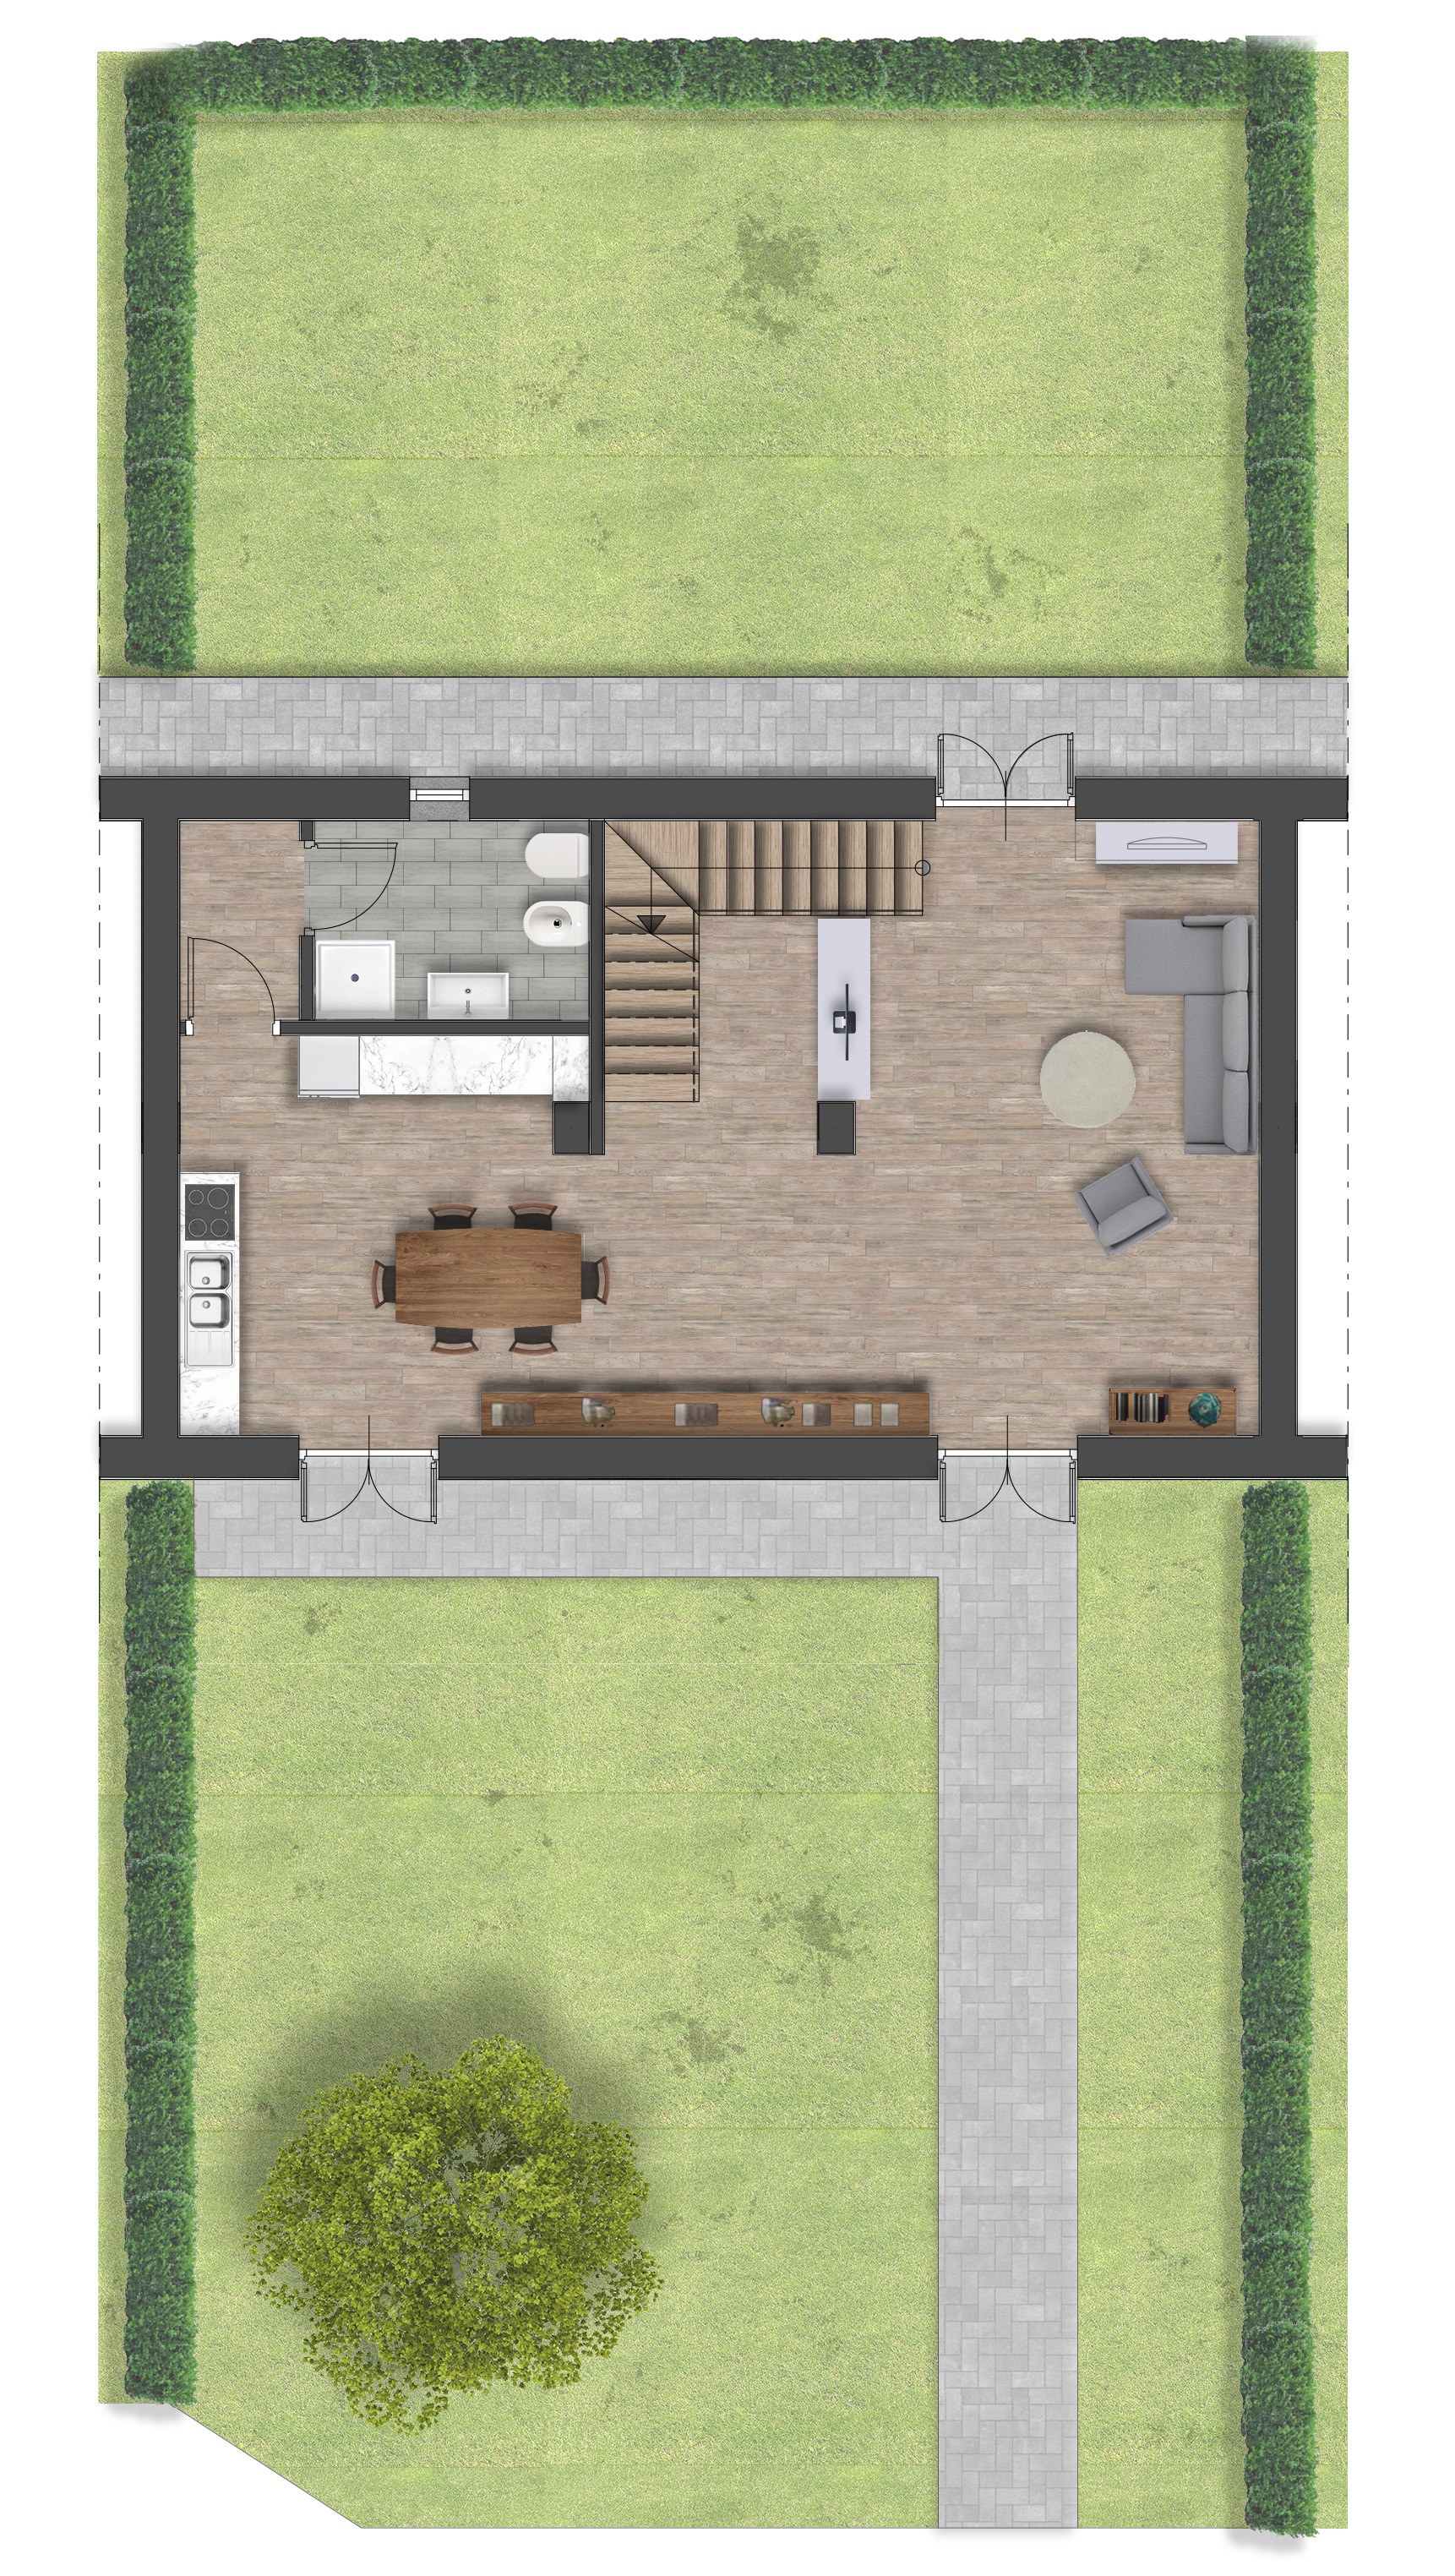 Luserna S.G. – Via Fuhrmann – Residenza Lavanda – Alloggio 7